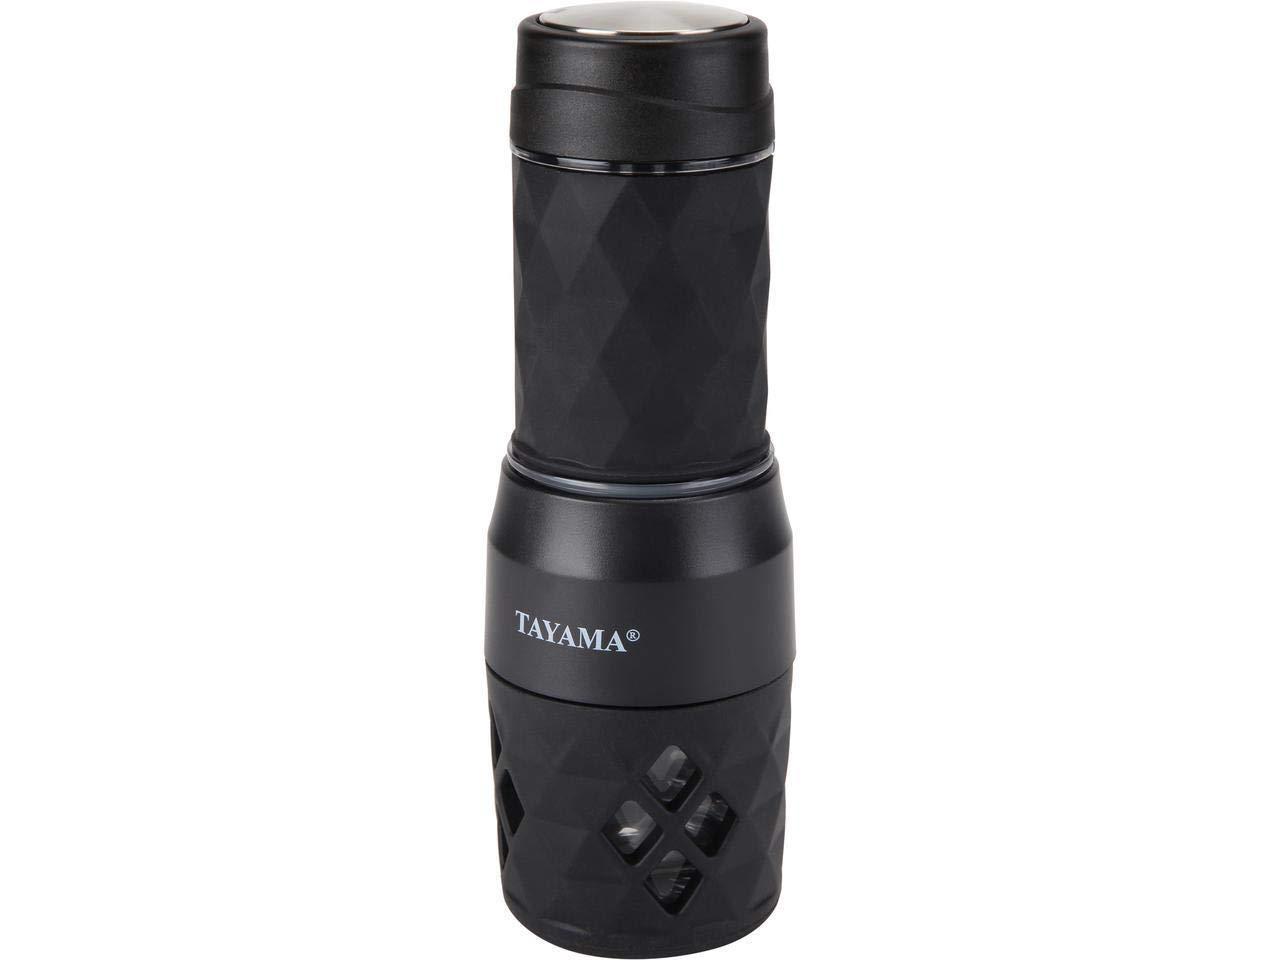 Tayama TMS-838 Portable Hot/Cold Espresso Machine, one size, Black by Tayama